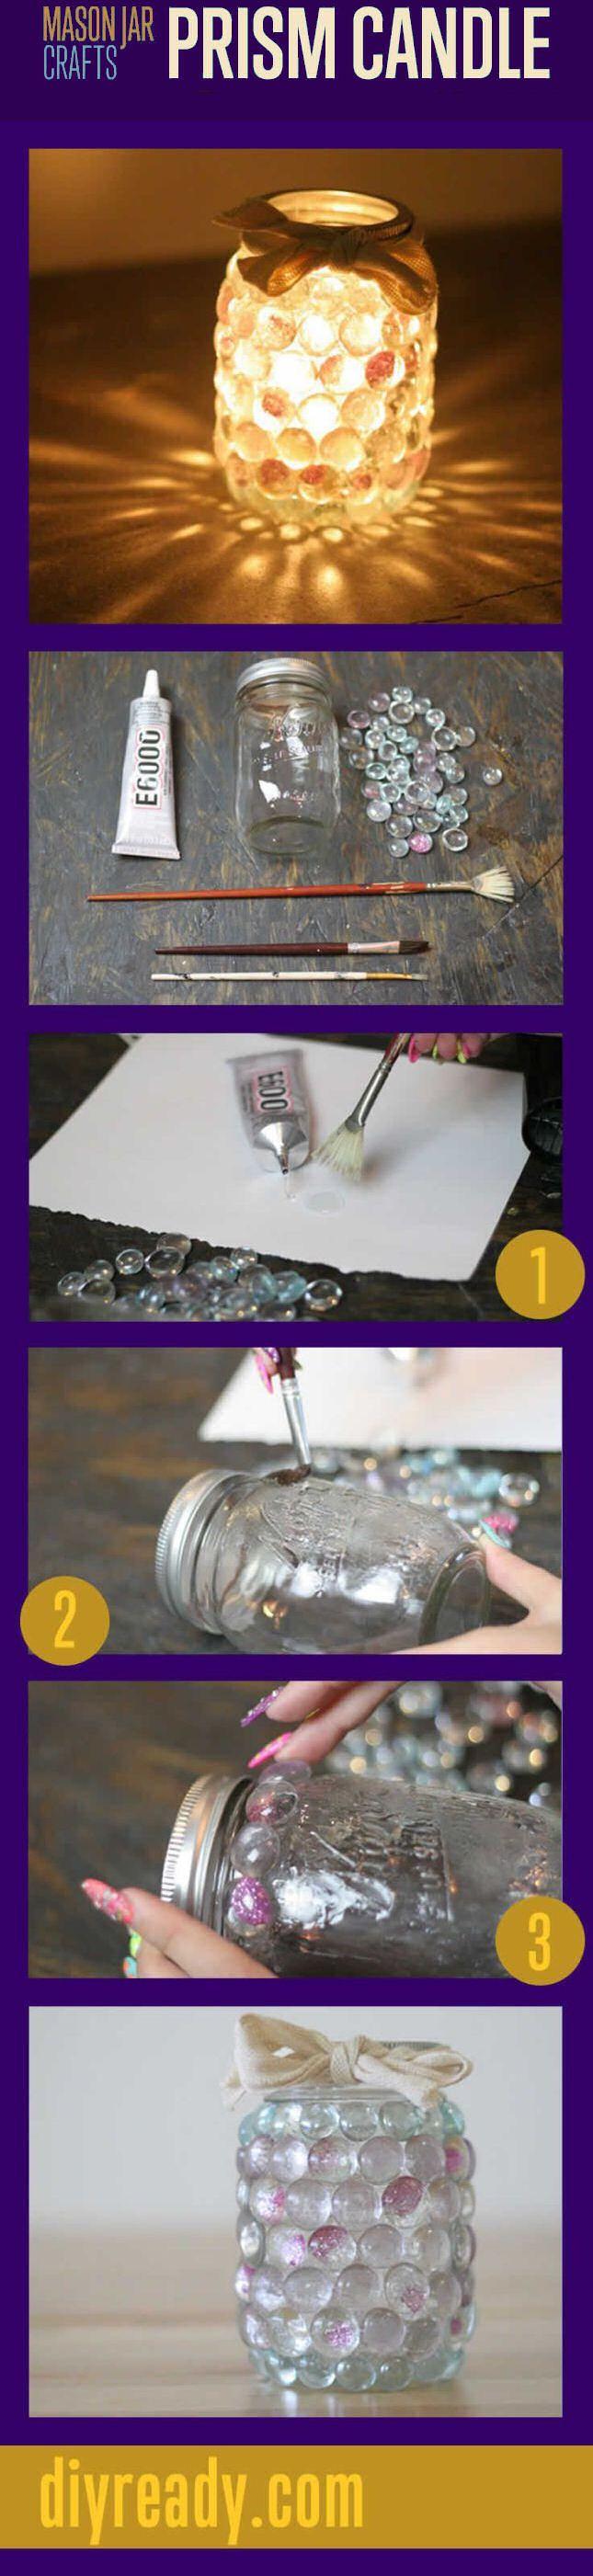 DIY Mason Jar Prism Light